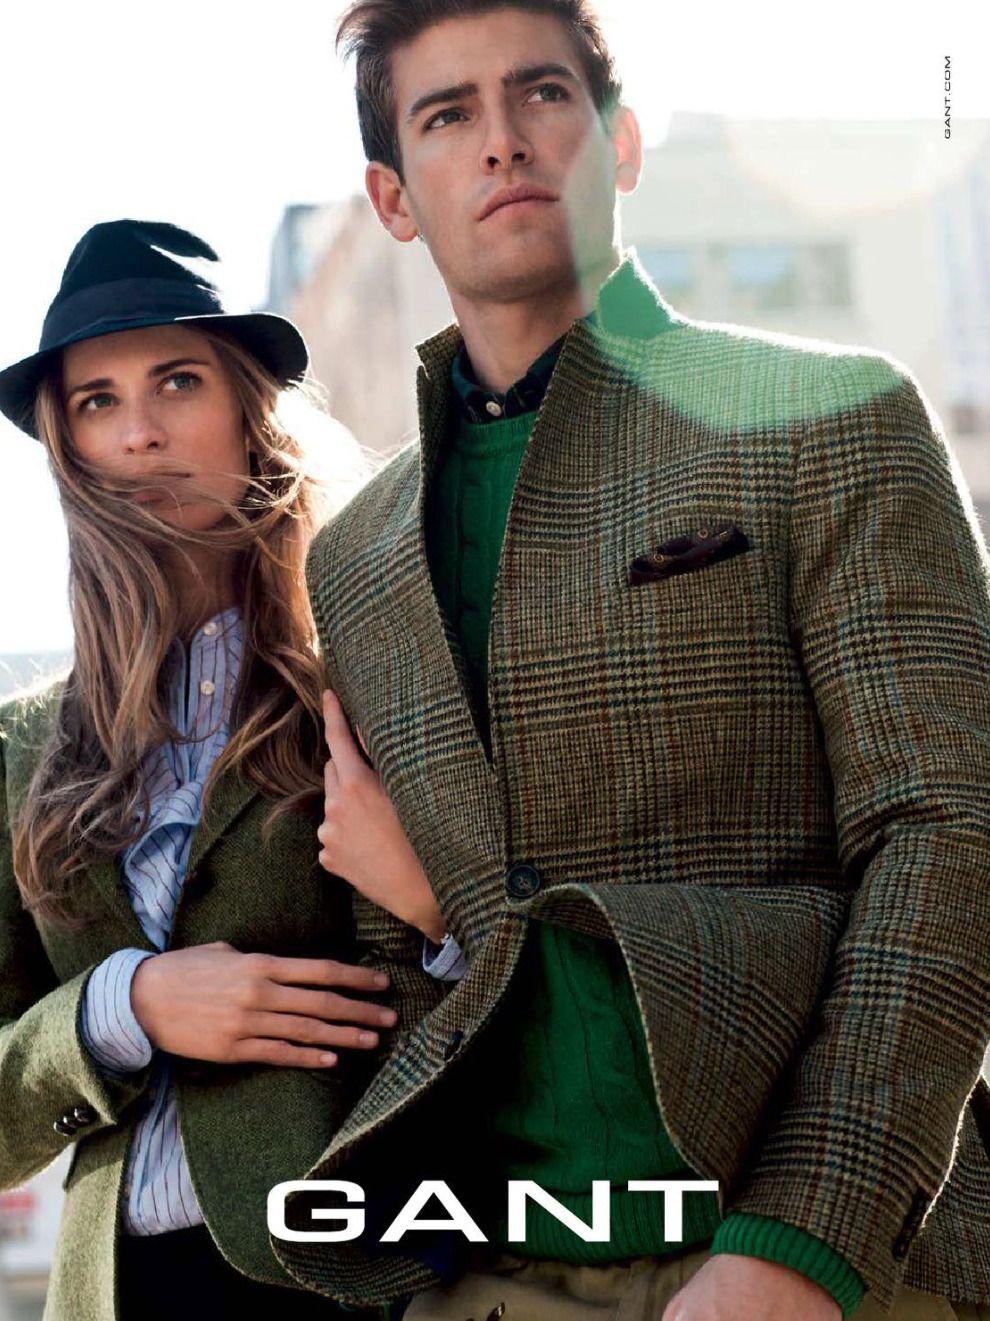 f27651da62d0 Gant FW12 | Fall Outfits - Men's Fasion | Fashion, Mens fashion и Style